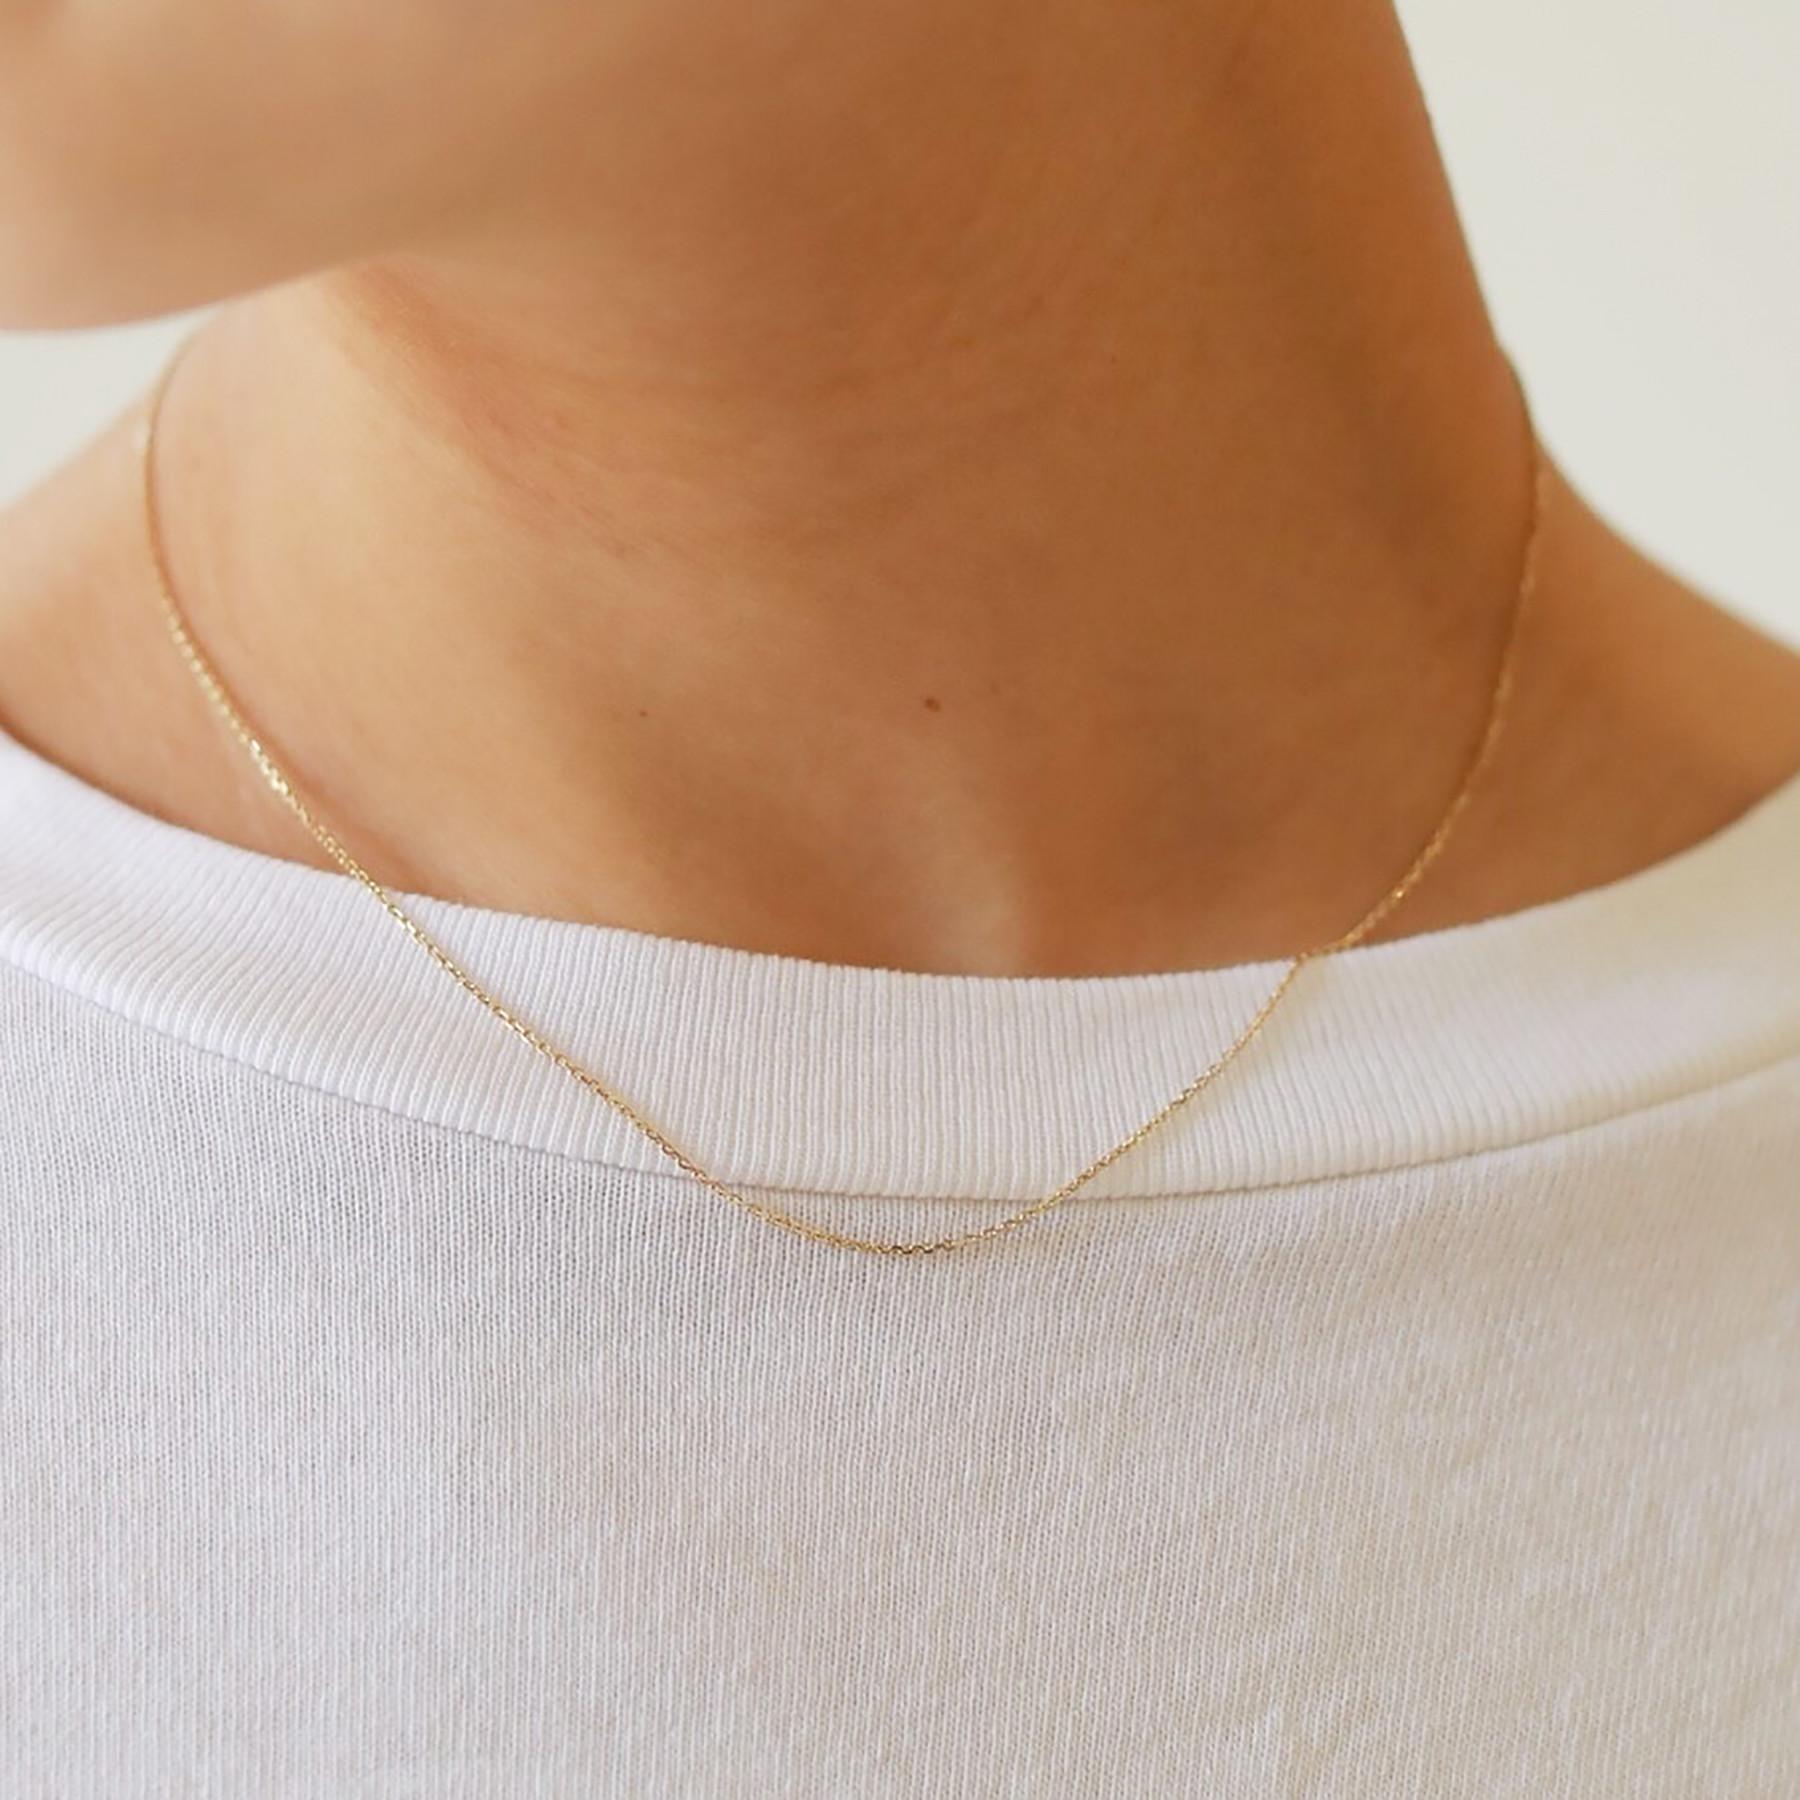 K10 Diamond Necklace